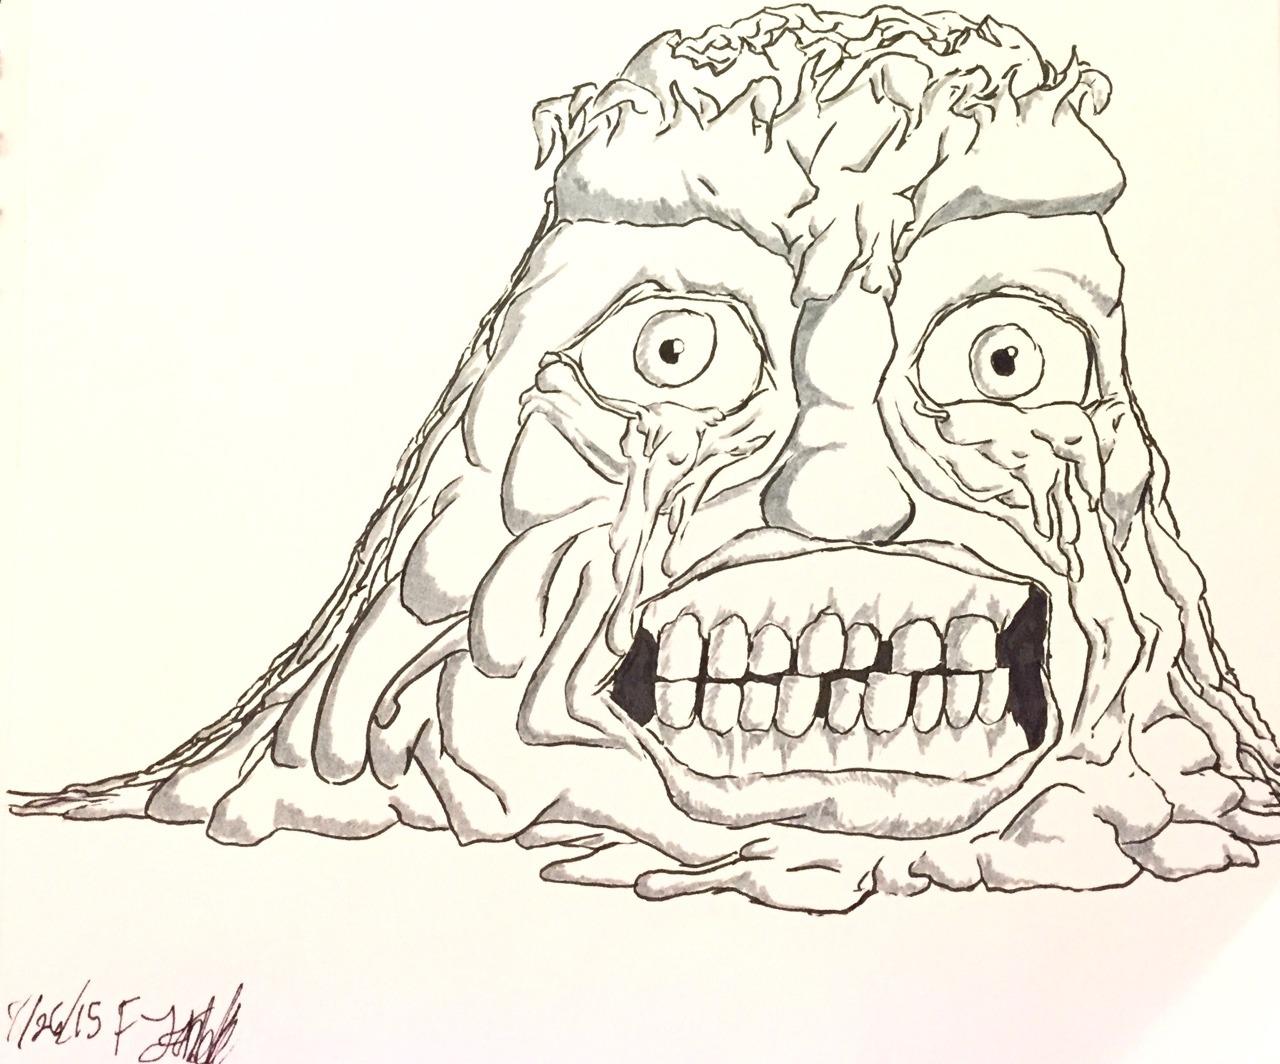 Drawn triipy cartoon character Severe goop comics artists cartoon